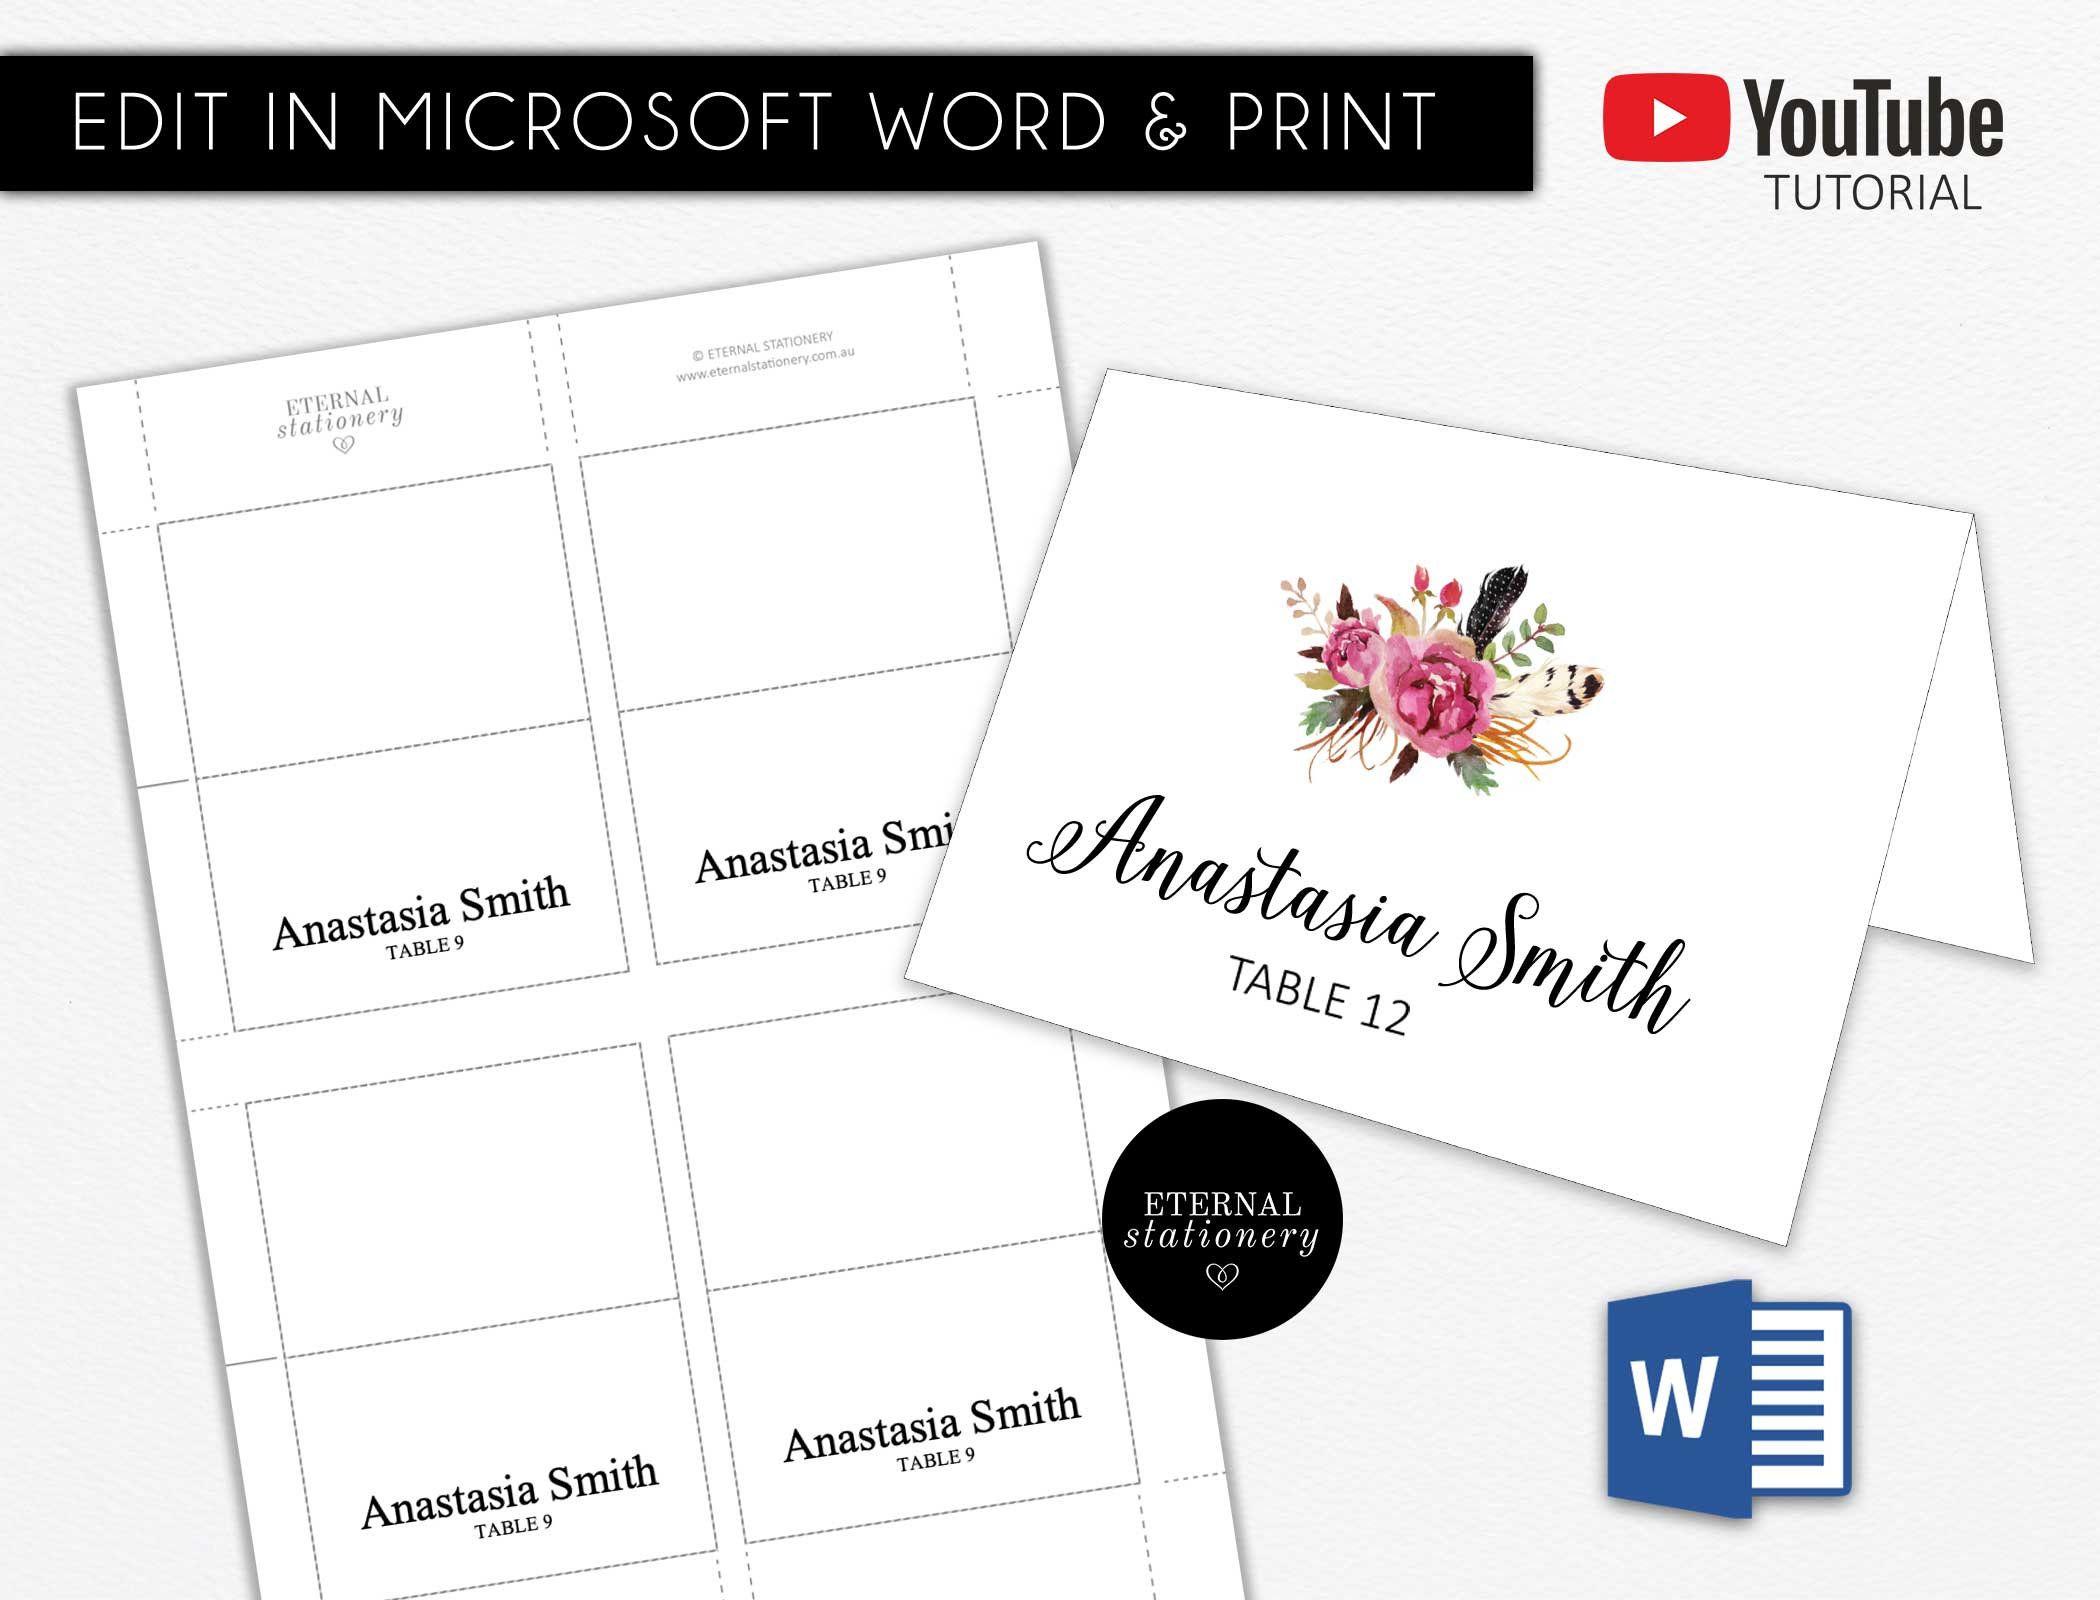 Diy Editable Microsoft Word Place Card Template Wedding Place Etsy Place Card Template Tent Cards Wedding Place Cards